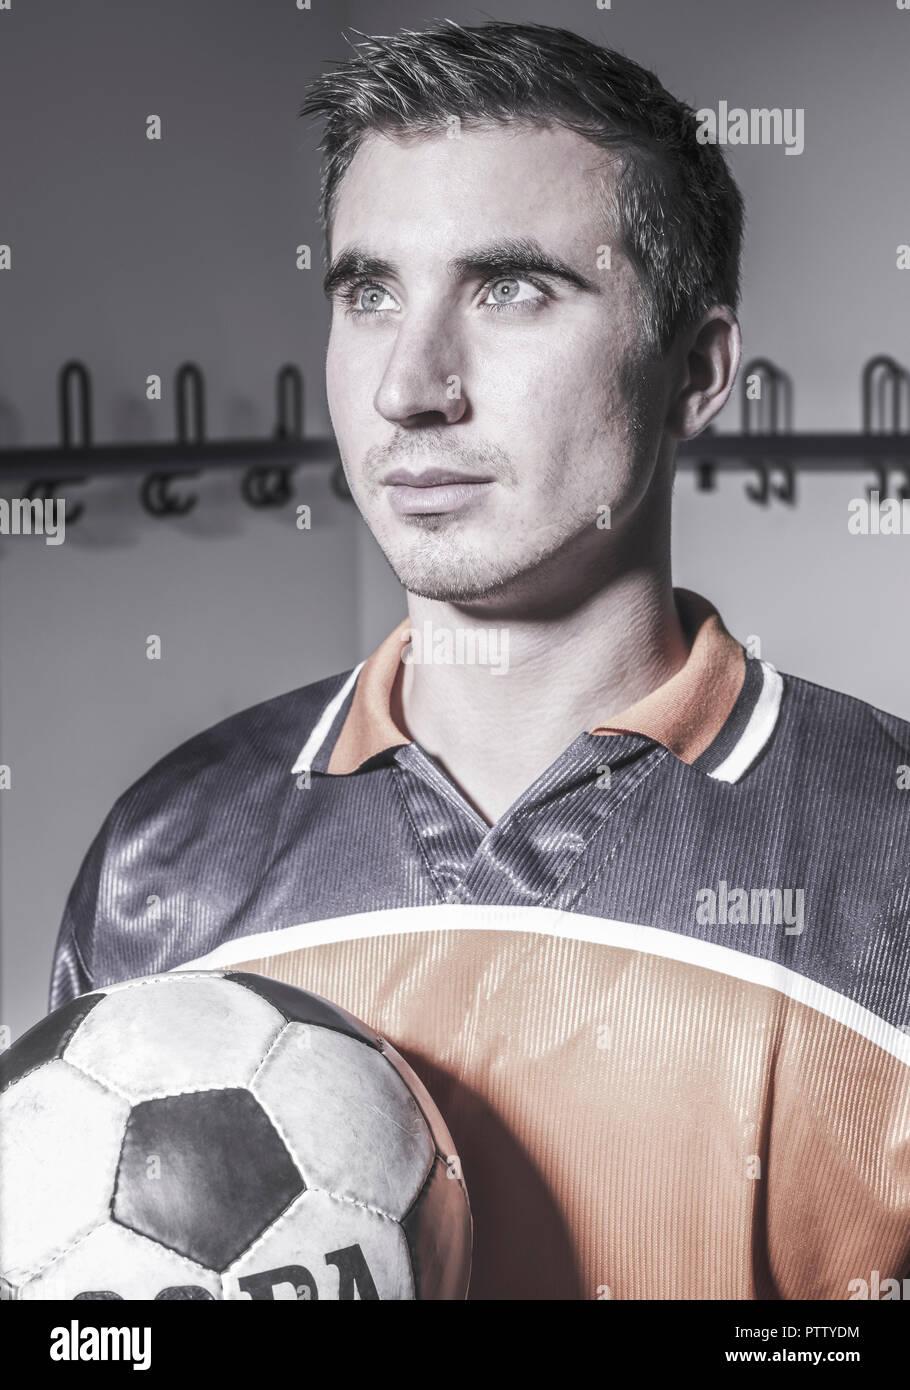 Fussballspieler mit Ball in Mannschaftskabine, Portraet (model-released) - Stock Image